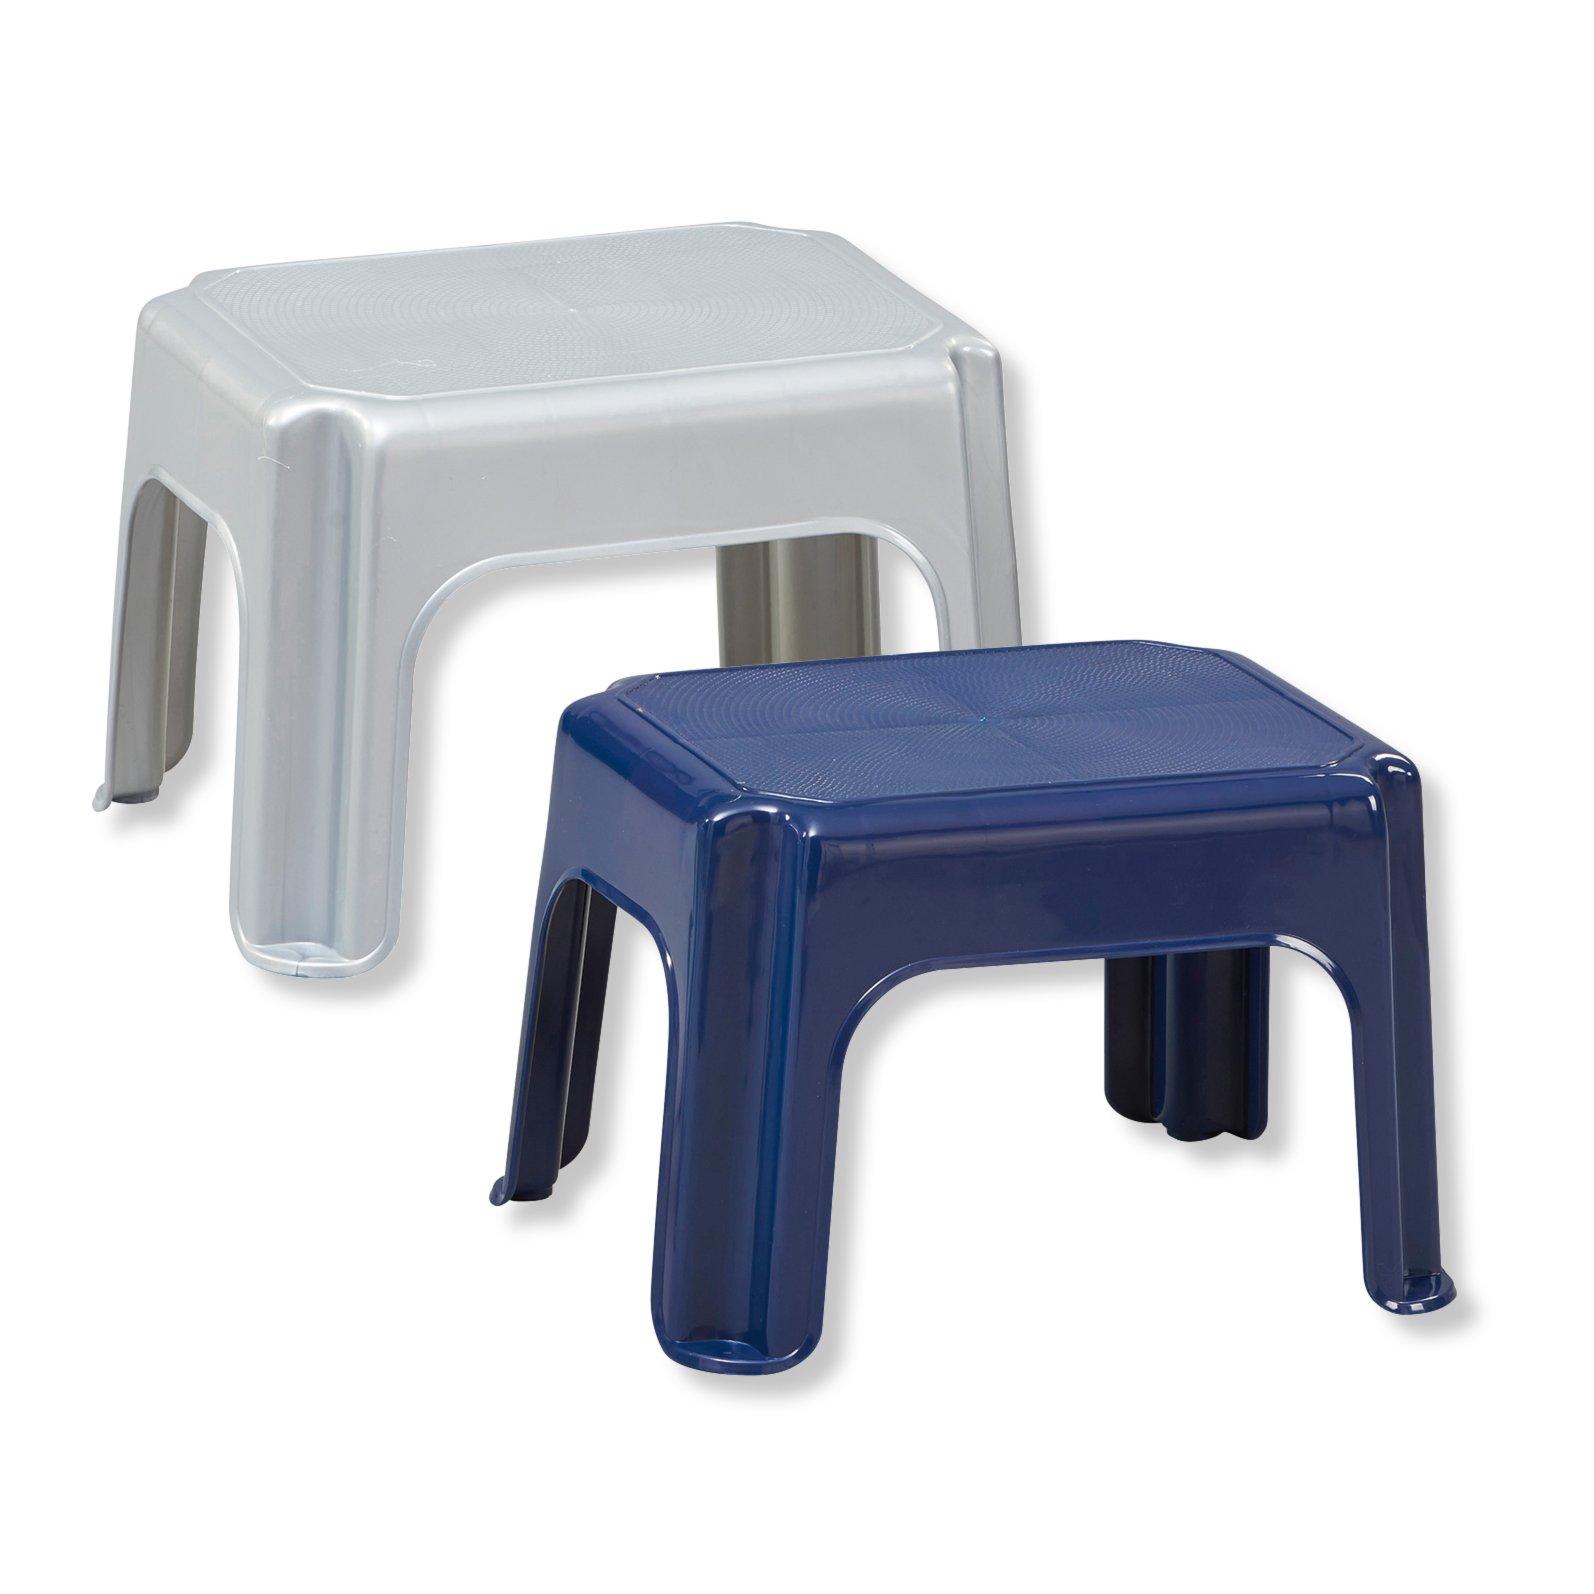 roller trittschemel fu bank in zwei farben ebay. Black Bedroom Furniture Sets. Home Design Ideas